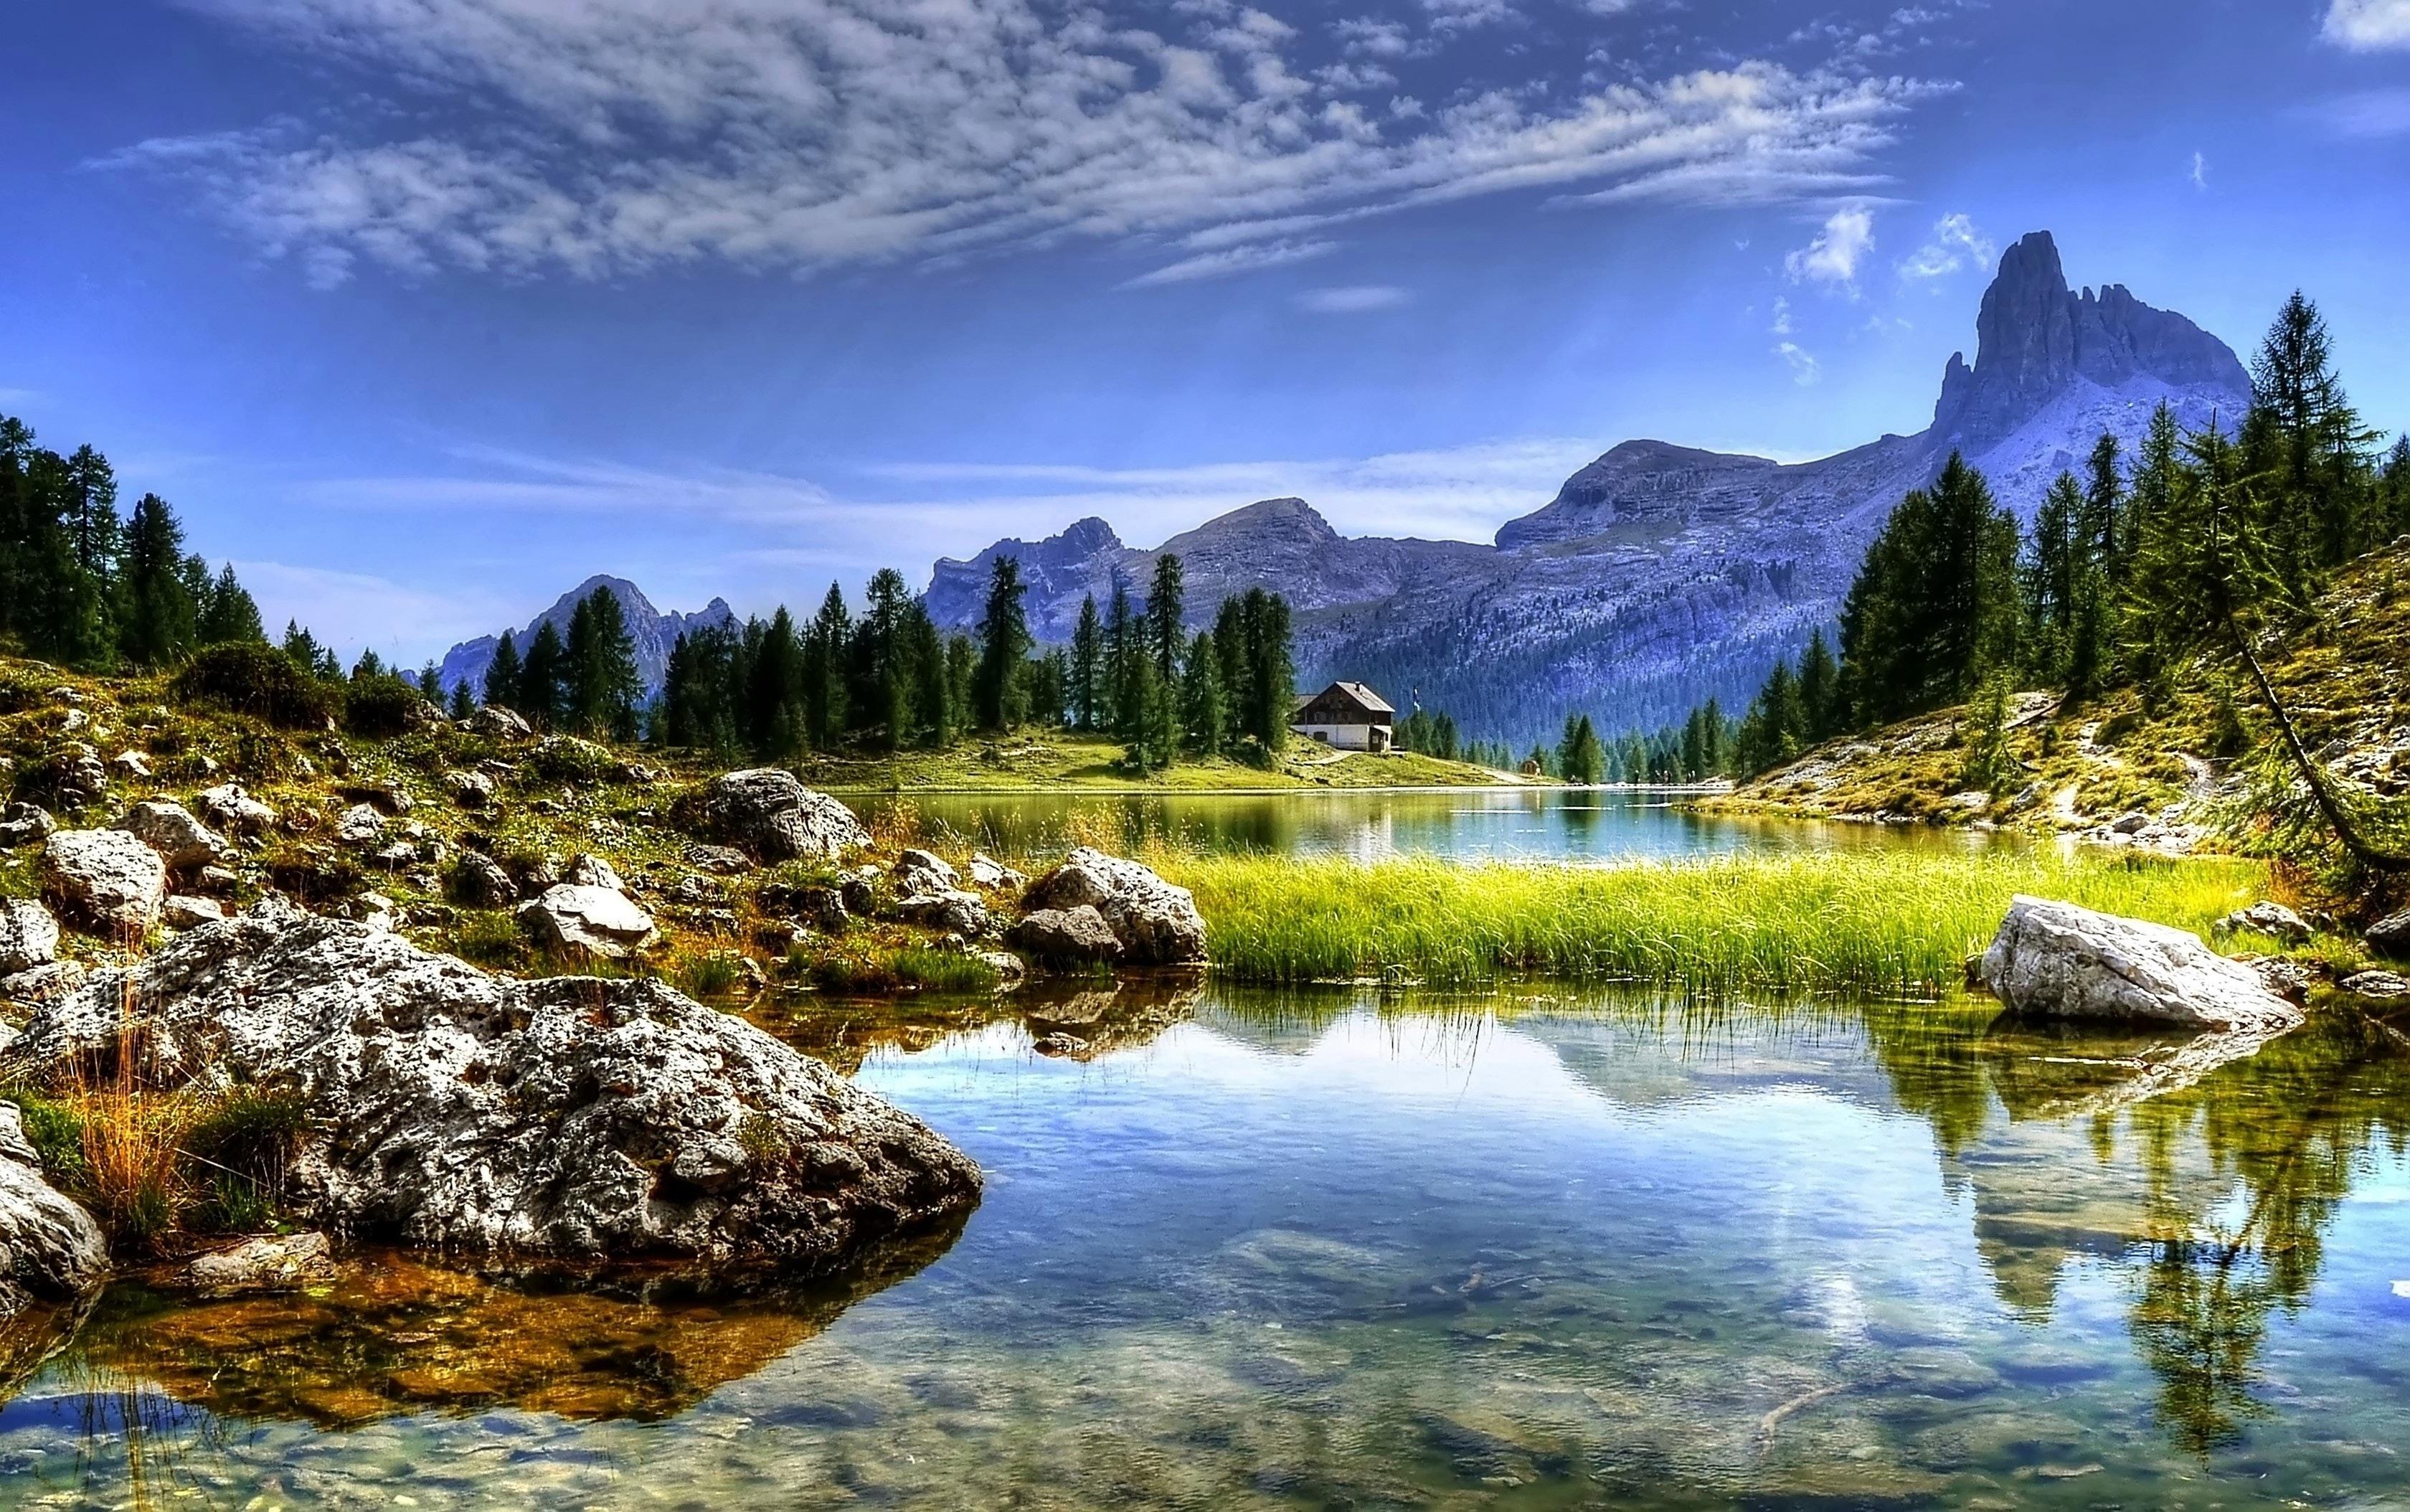 Best Wallpaper High Resolution Scenery - pexels-photo-371633  Graphic_885969.jpg\u0026fm\u003djpg